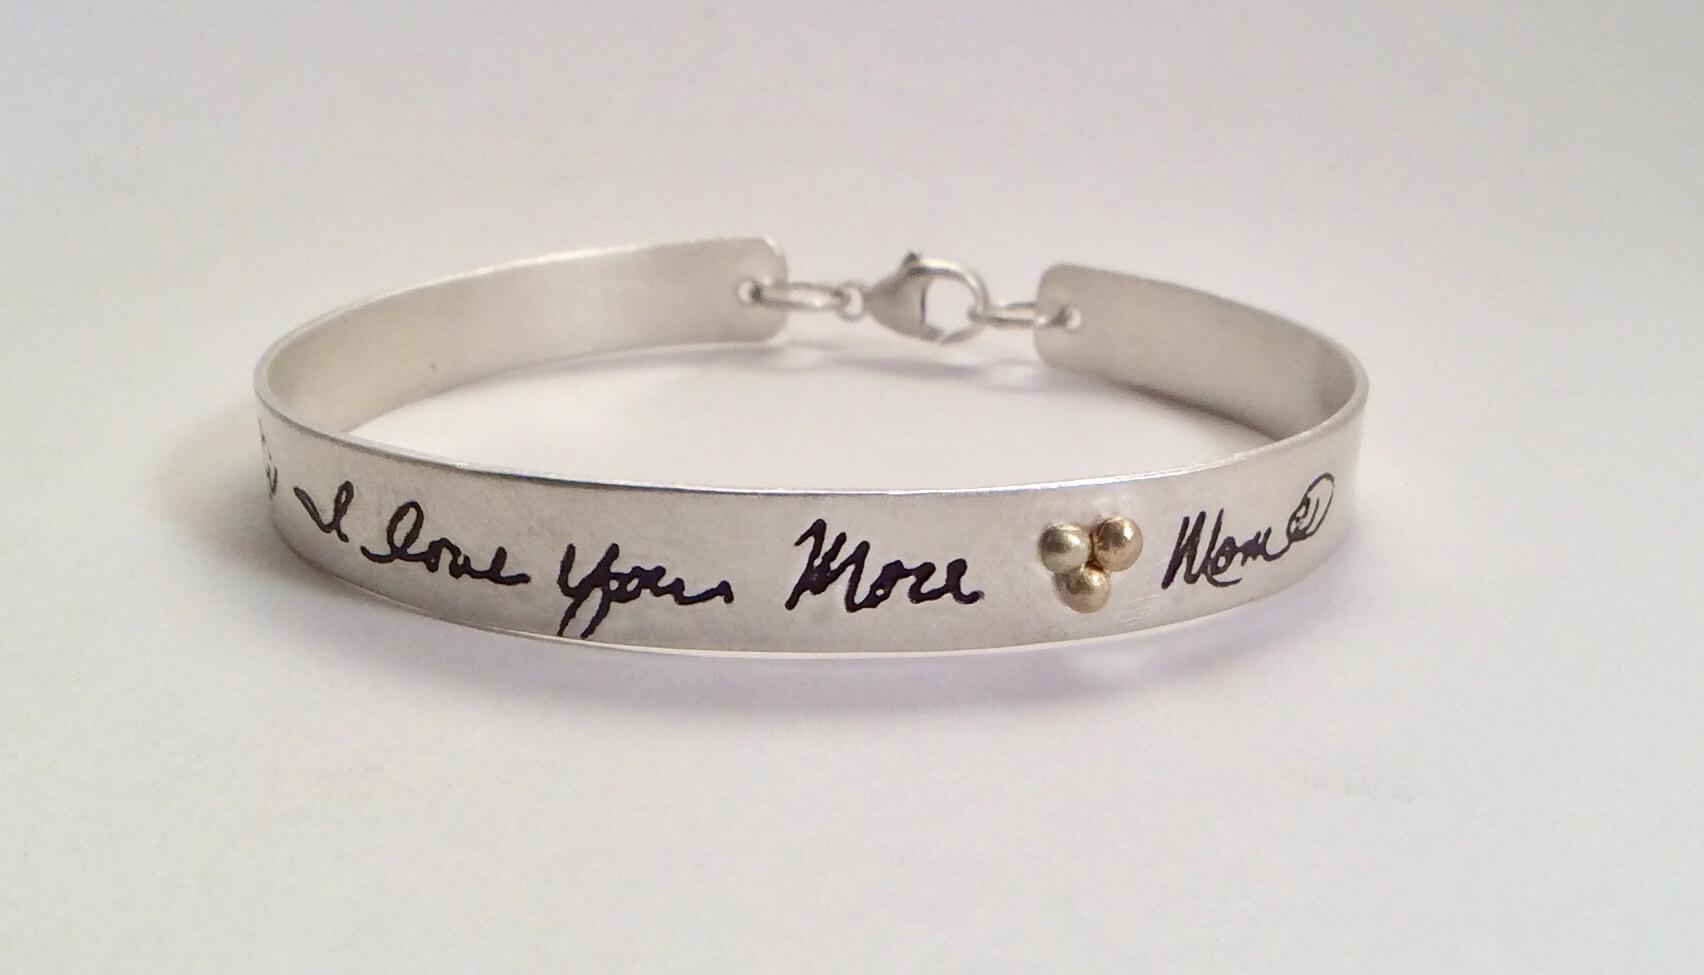 From the Heart thin bangle bracelet